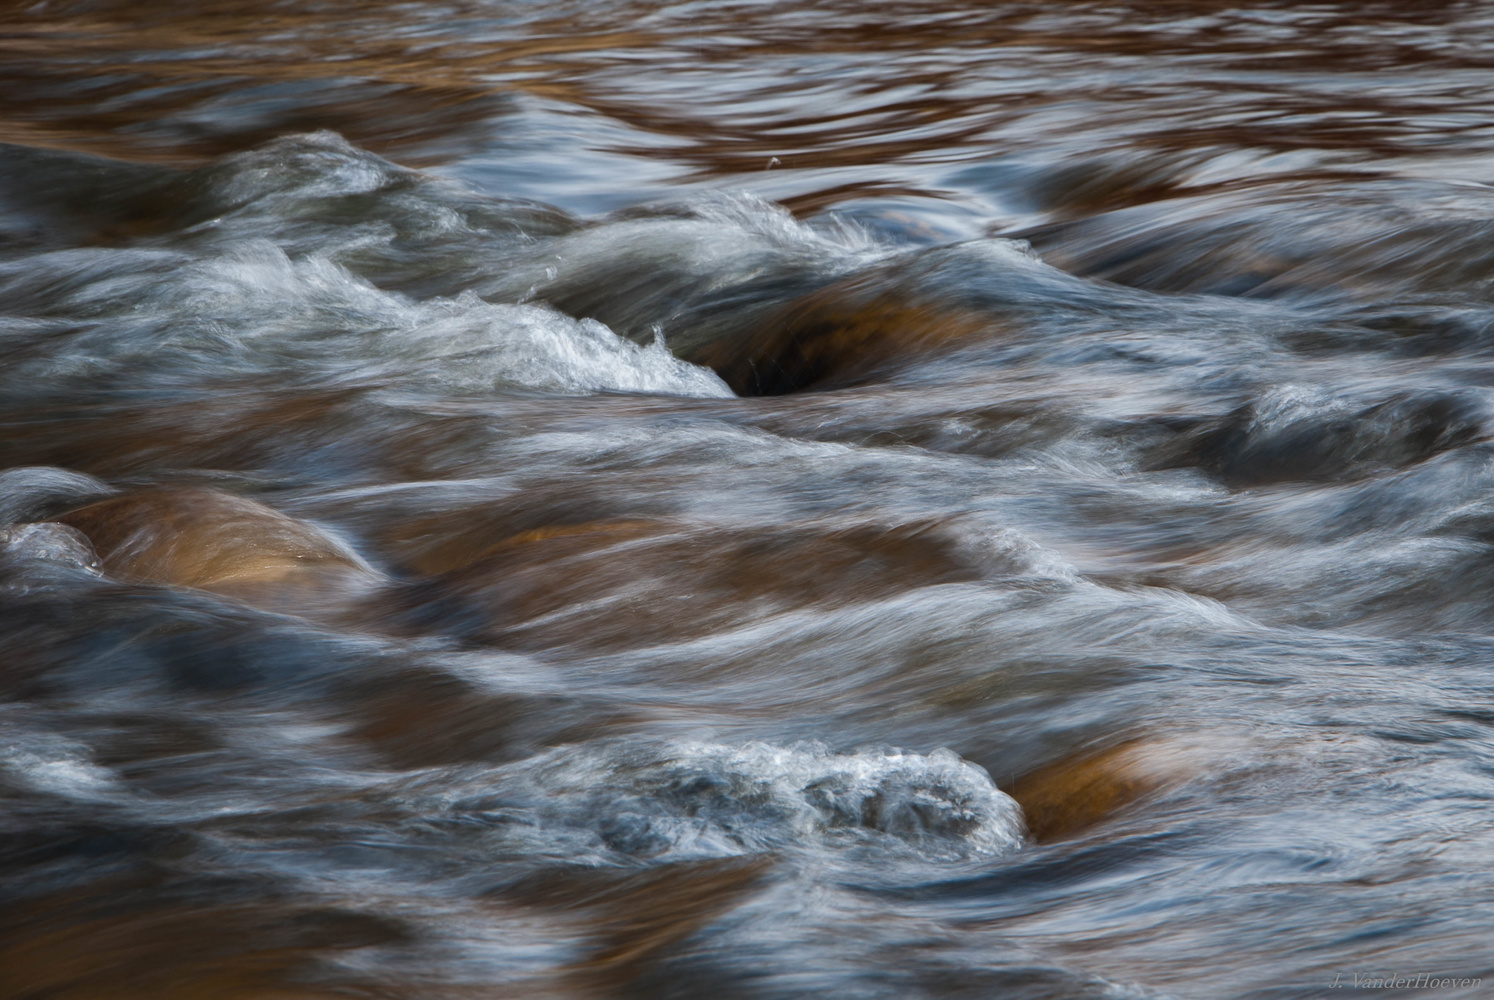 River Flow by Jake VanderHoeven